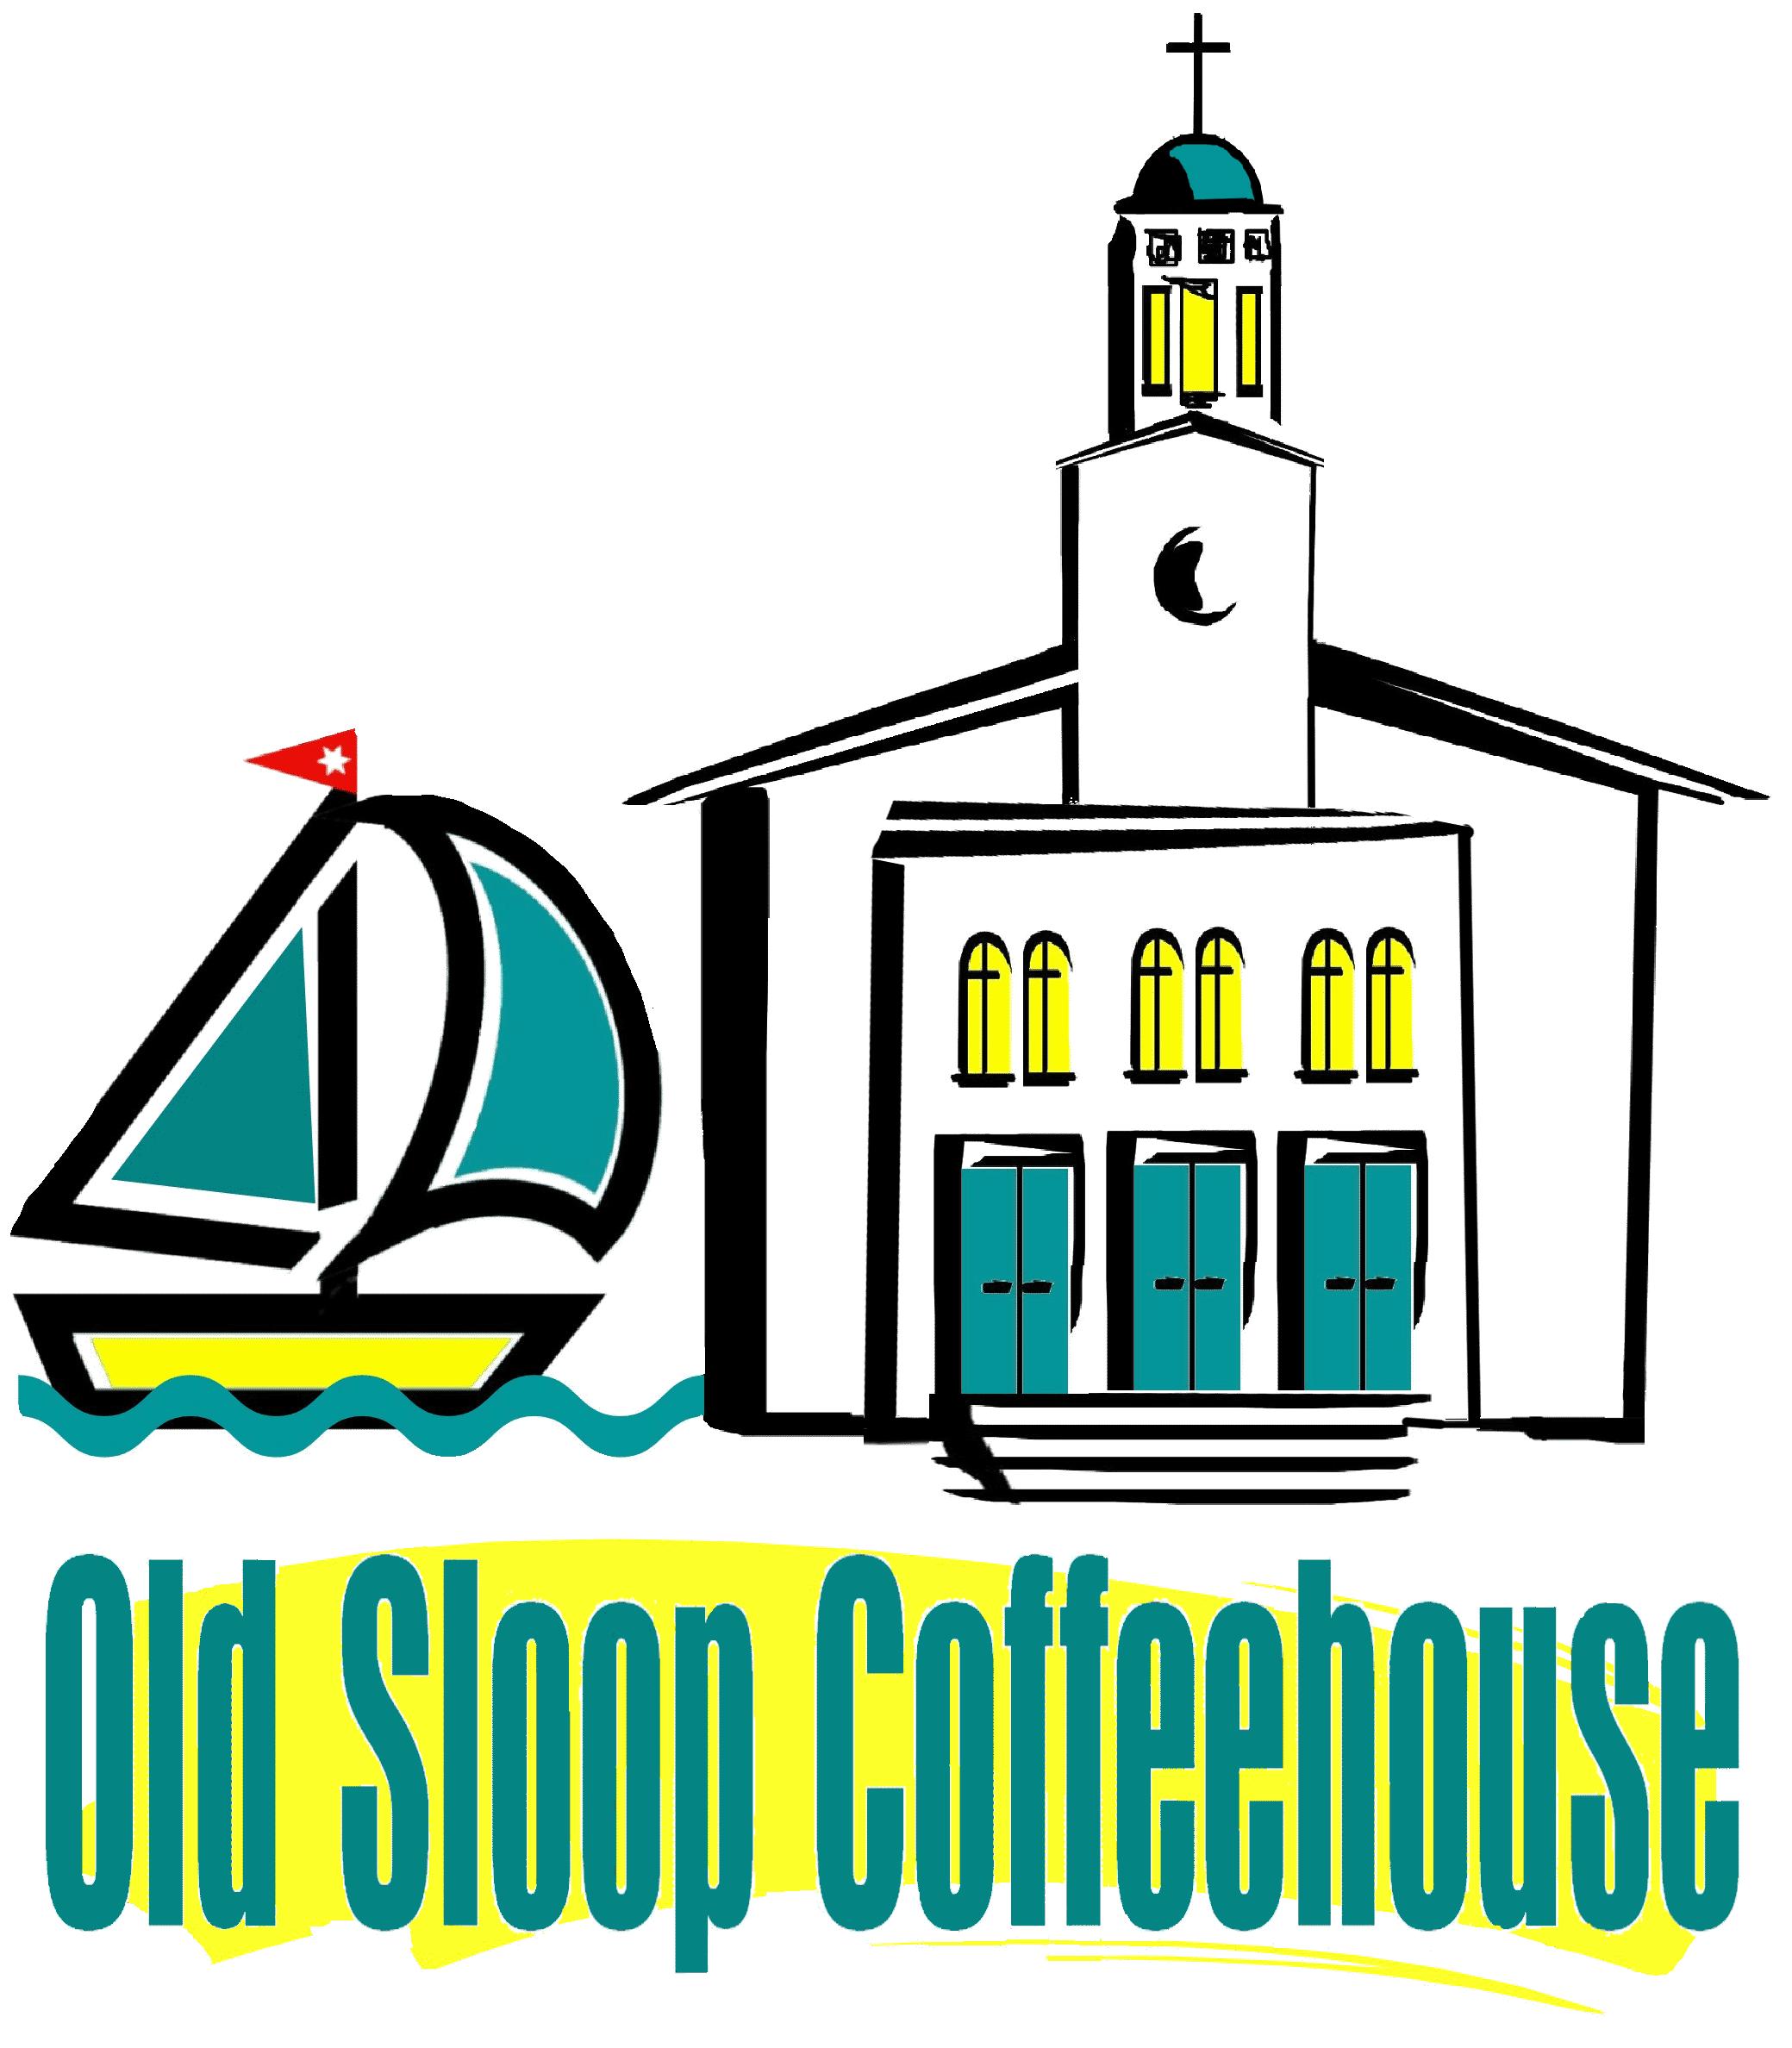 coffeehouse-logo_(1).png